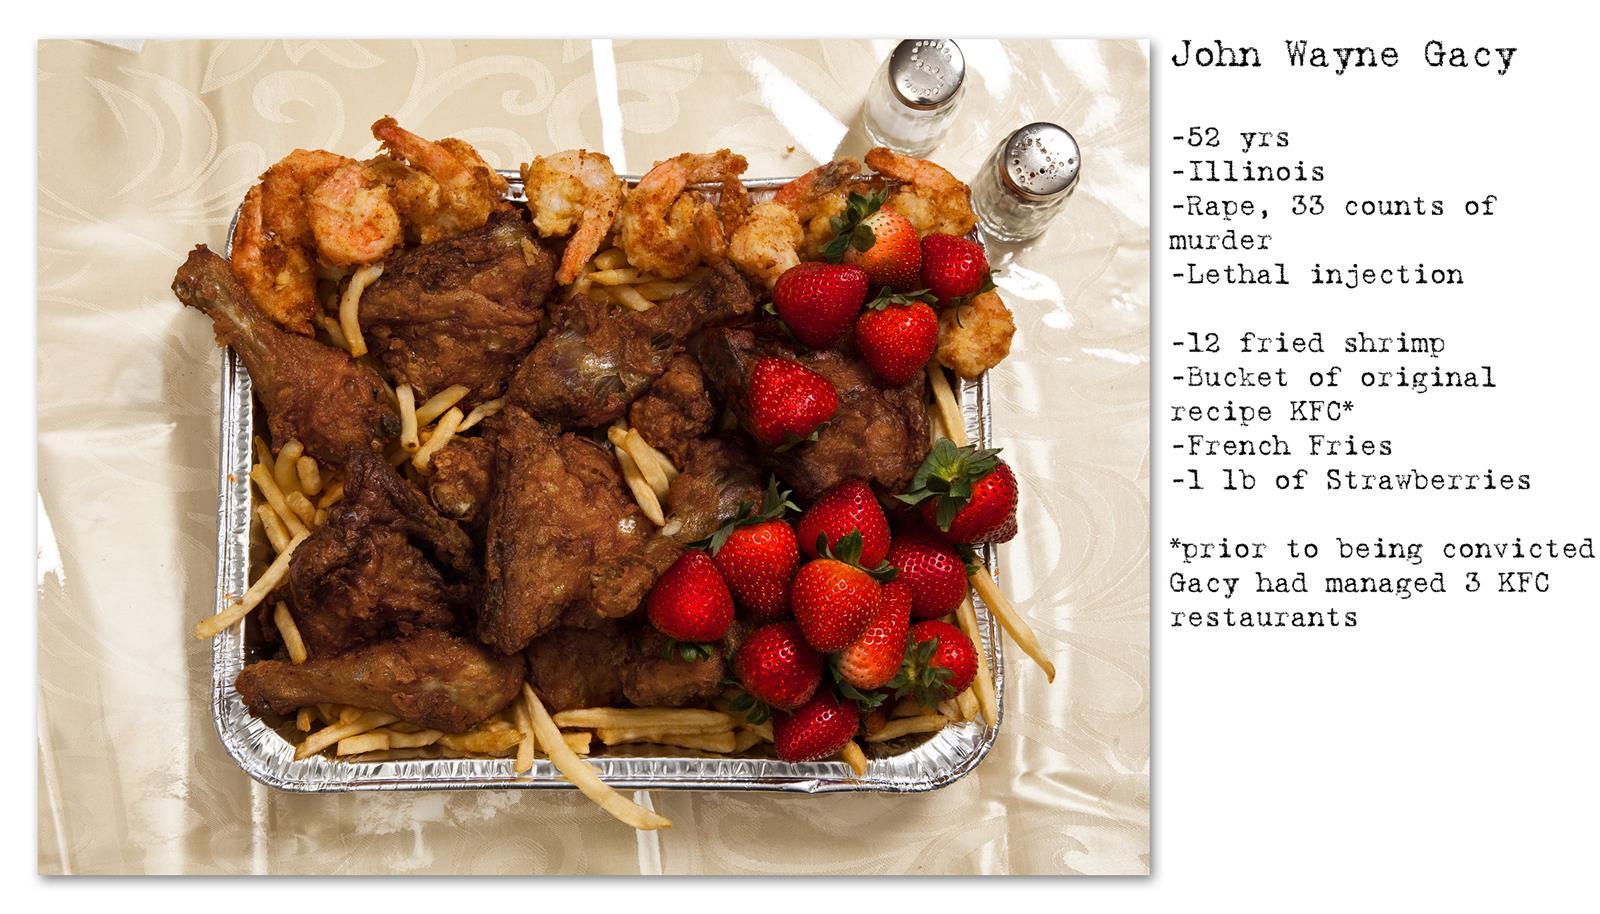 Death Row Prisoner's Last Meal (6)